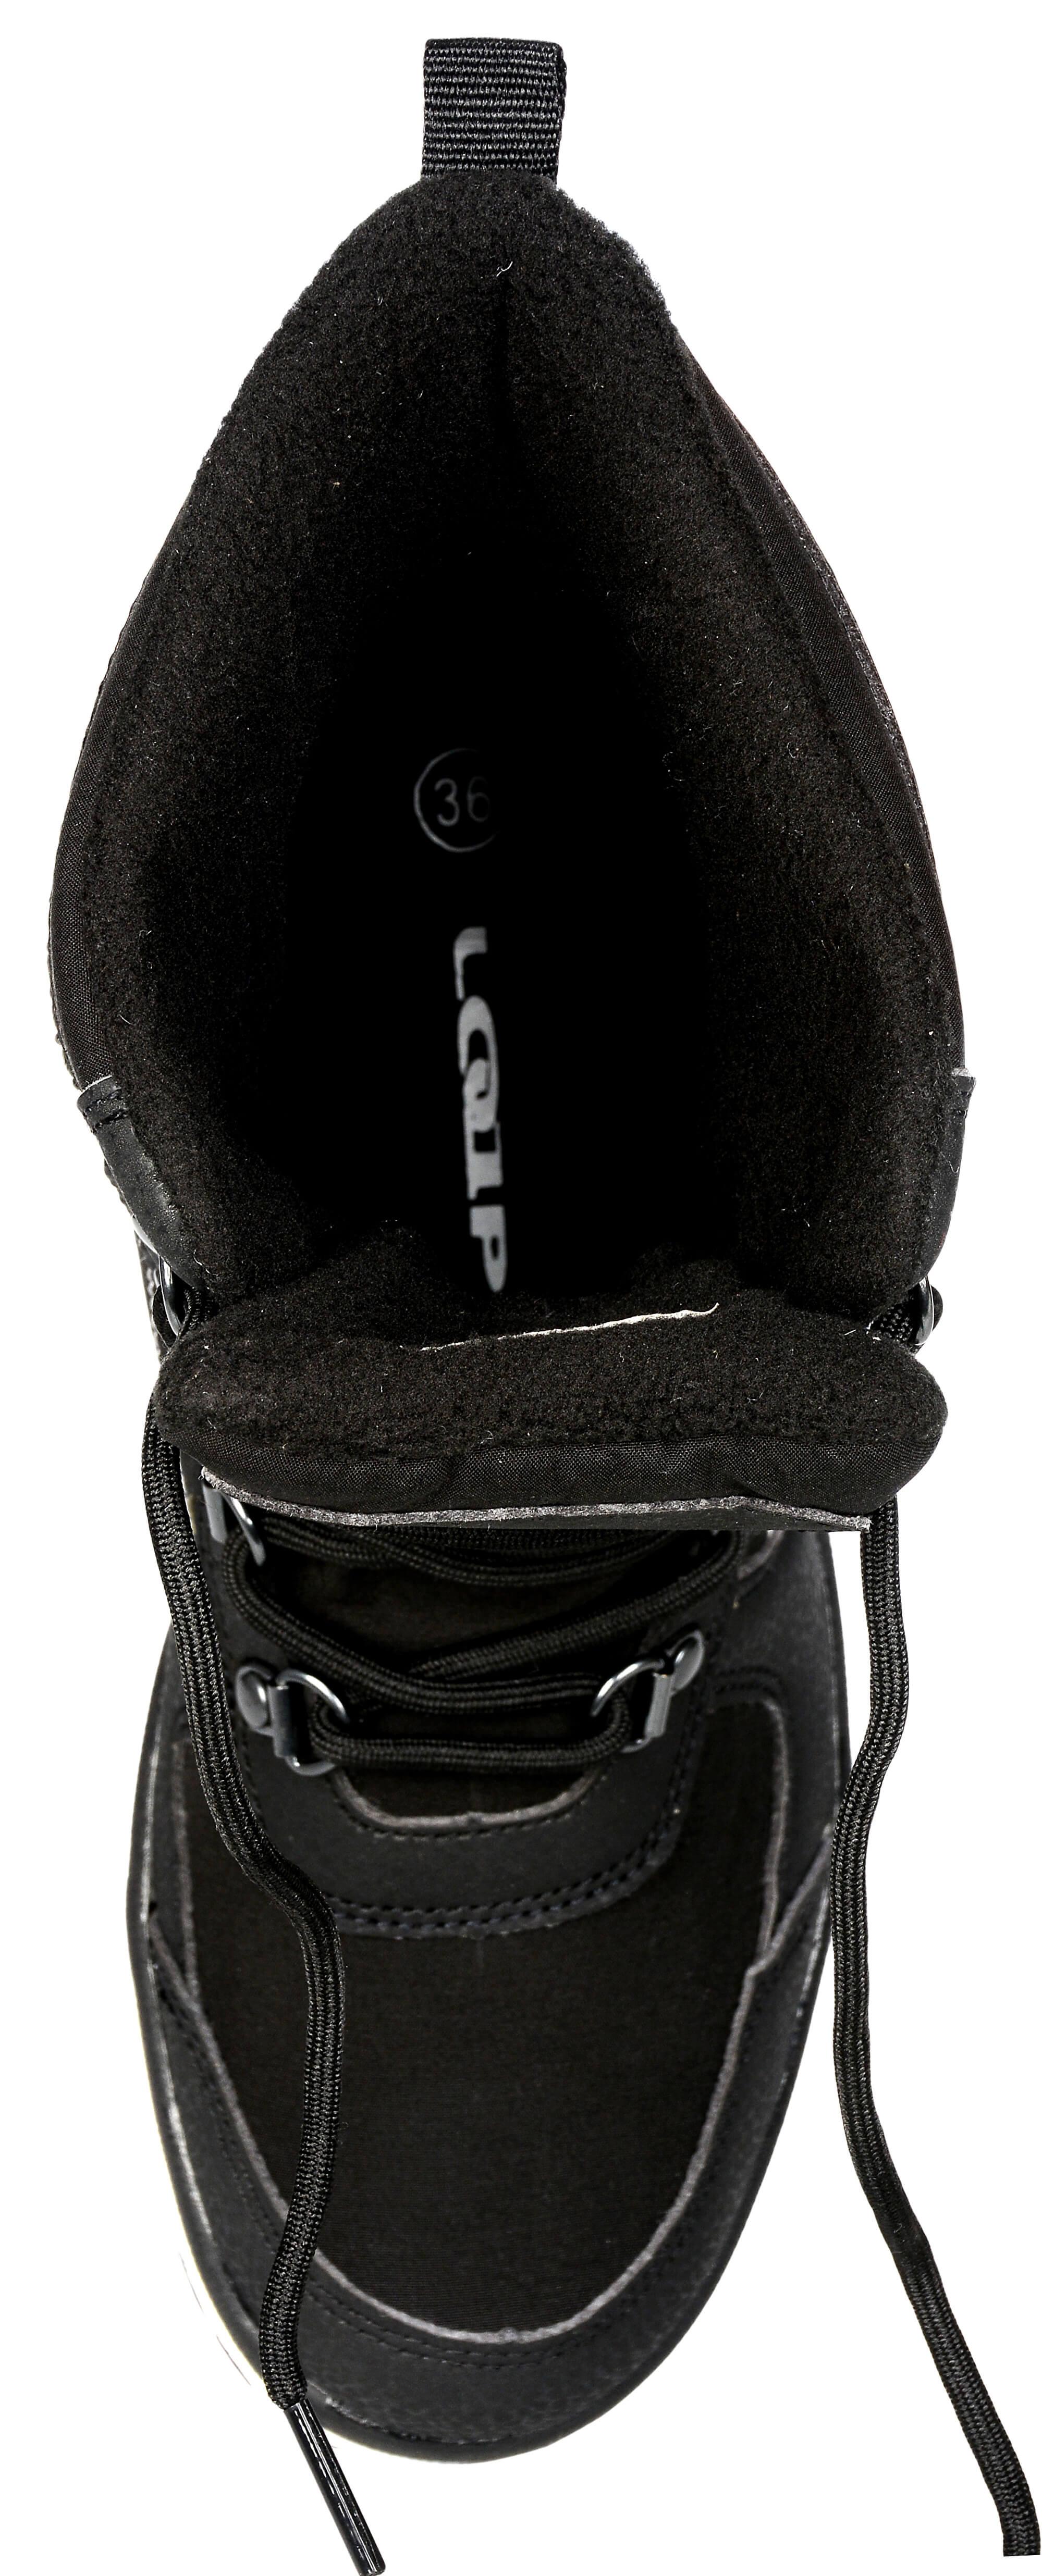 cc4b9e7dbb9 LOAP Dámské zimní boty Denia Black Bl De Blanc SBL1749-V11A Doprava ...